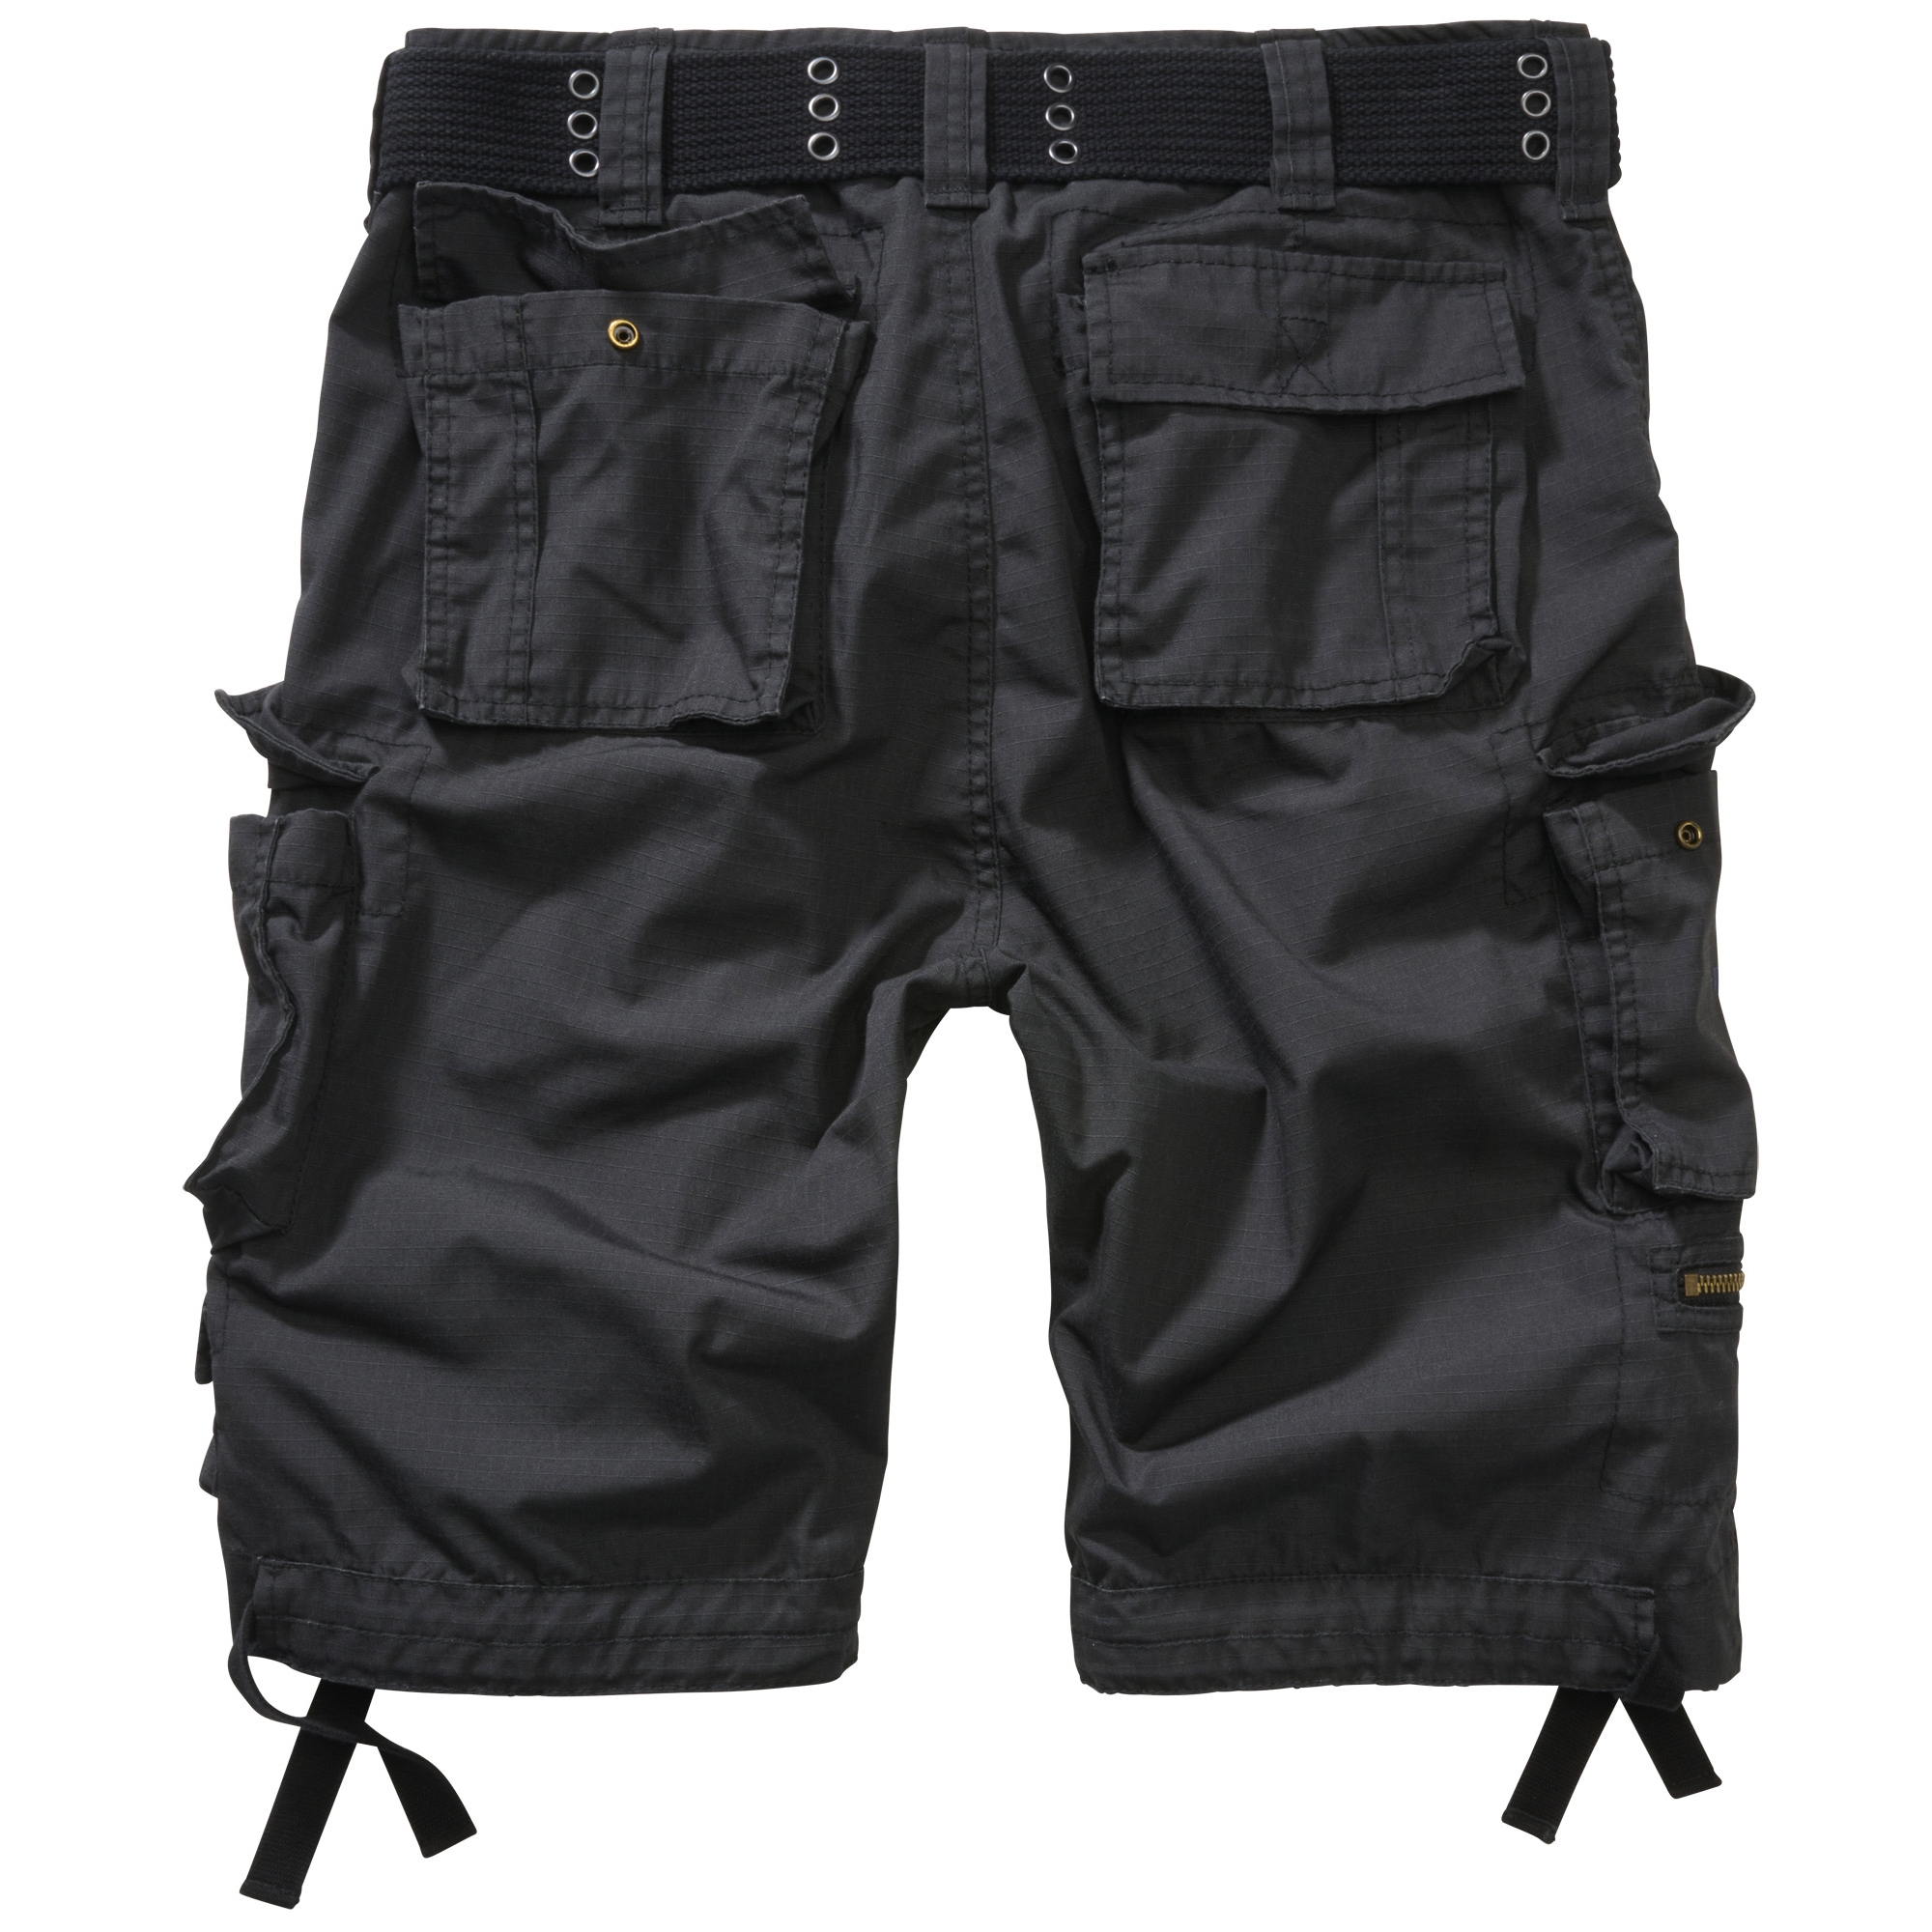 Brandit-Urban-Legend-Herren-Cargo-Shorts-Bermuda-Kurze-Hose-Short-US-Army Indexbild 3